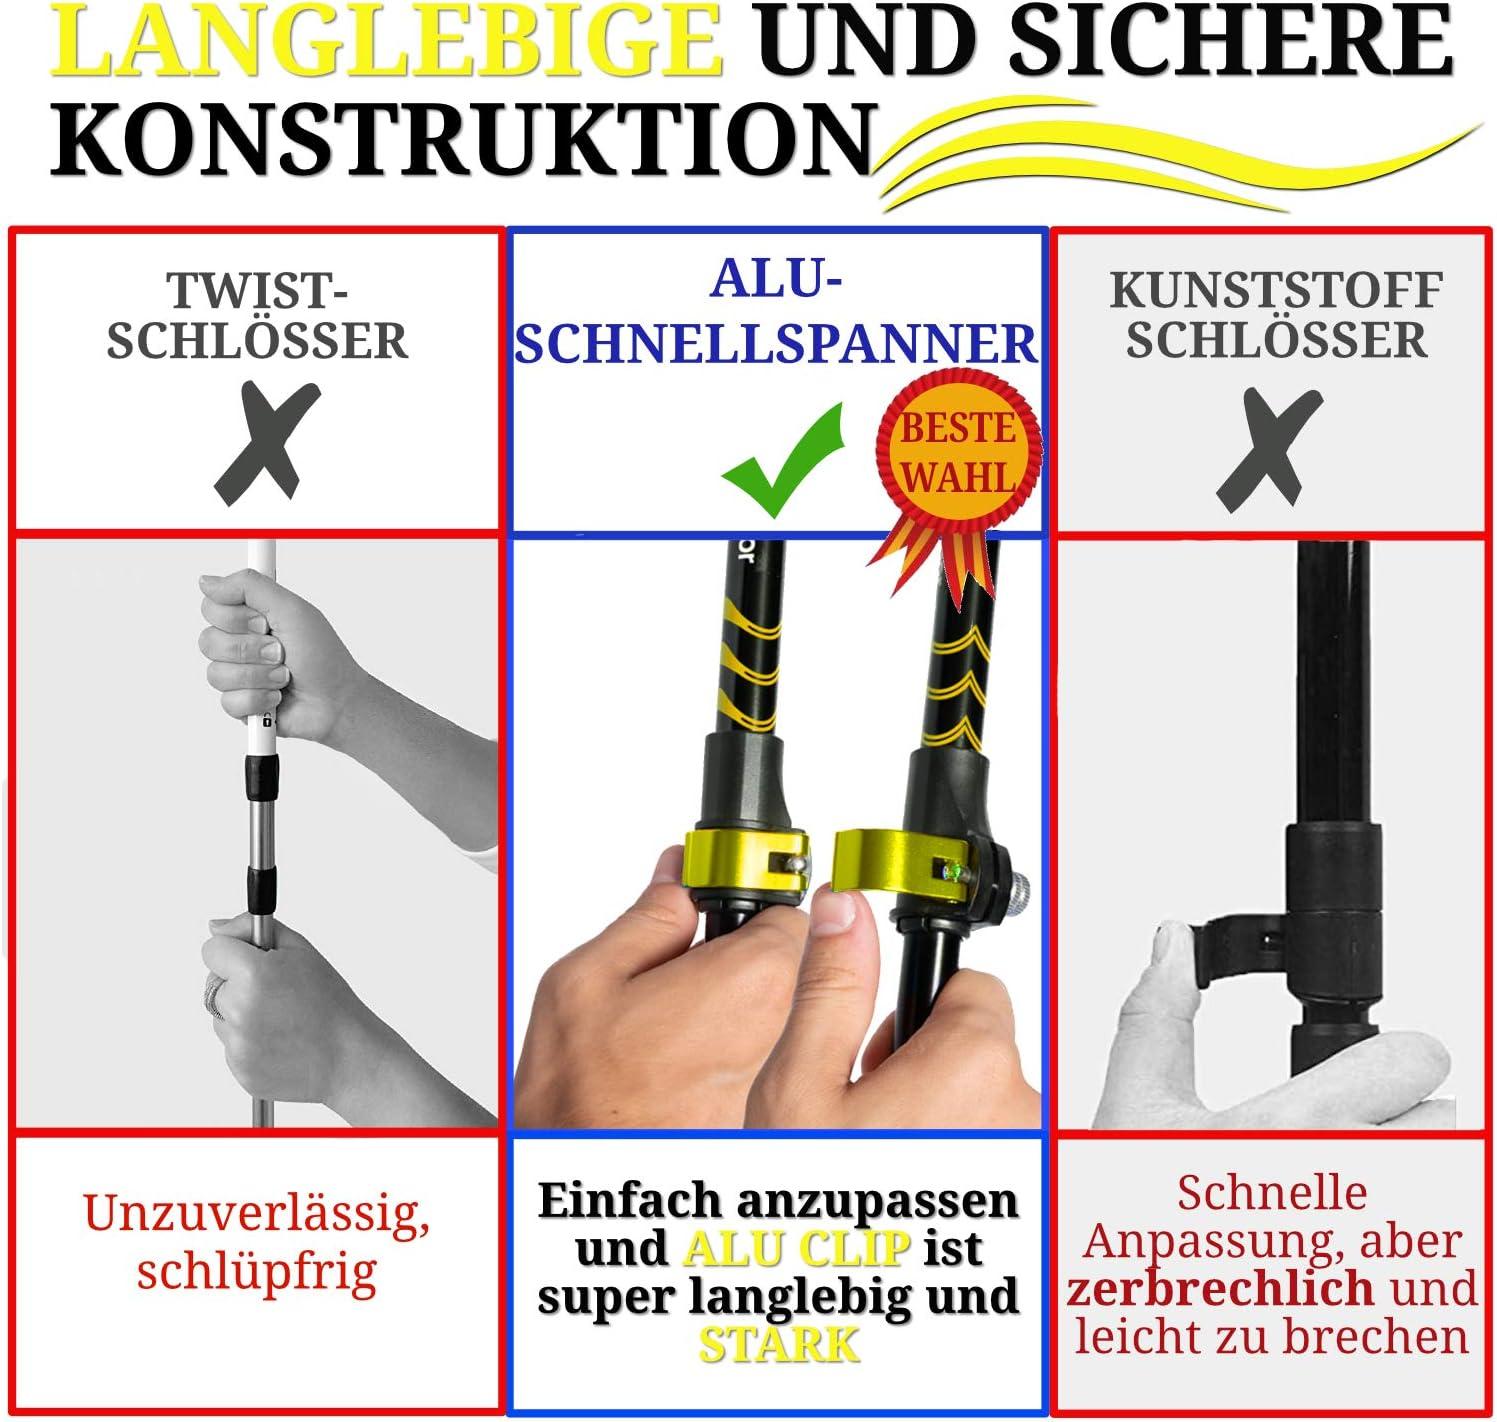 Korkgriff SpOutdoor/® Wanderst/öcke Teleskop Trekkingst/öcke Aluminium 7075 Leicht stark und Klemmverschluss Einziehbarer Teleskop Walking st/öcke